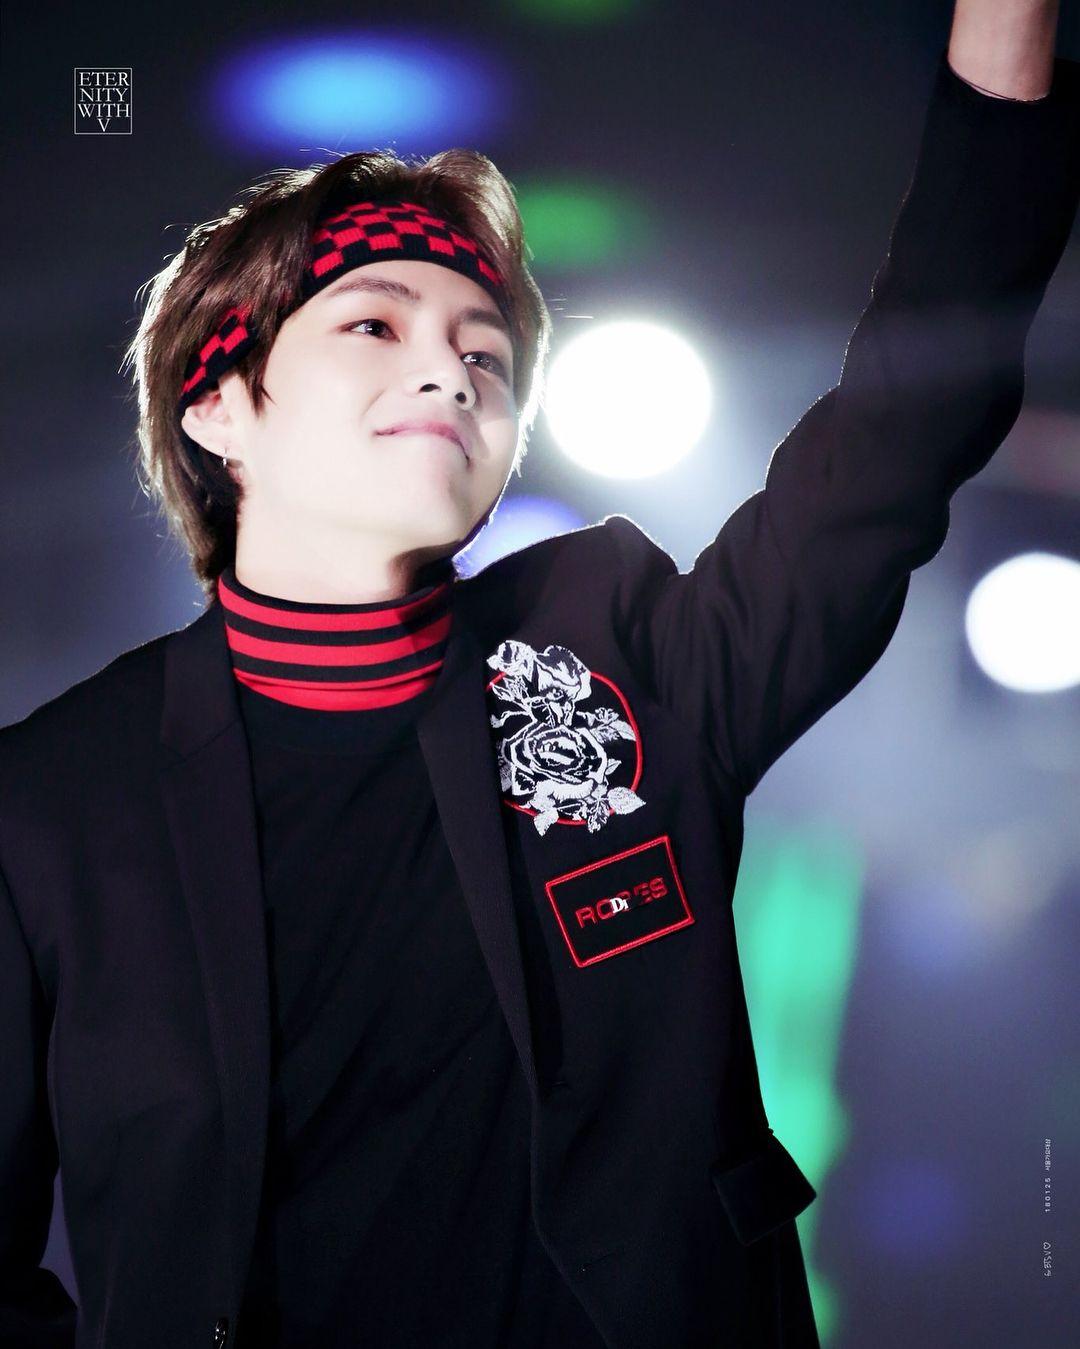 Most Handsome K Pop Male Idols Bts V Kim Tae Hyung Kpop K Pop Music K Pop Boy Groups Best Seoul Music Awards Seoul Music Awards 2017 Kim Taehyung